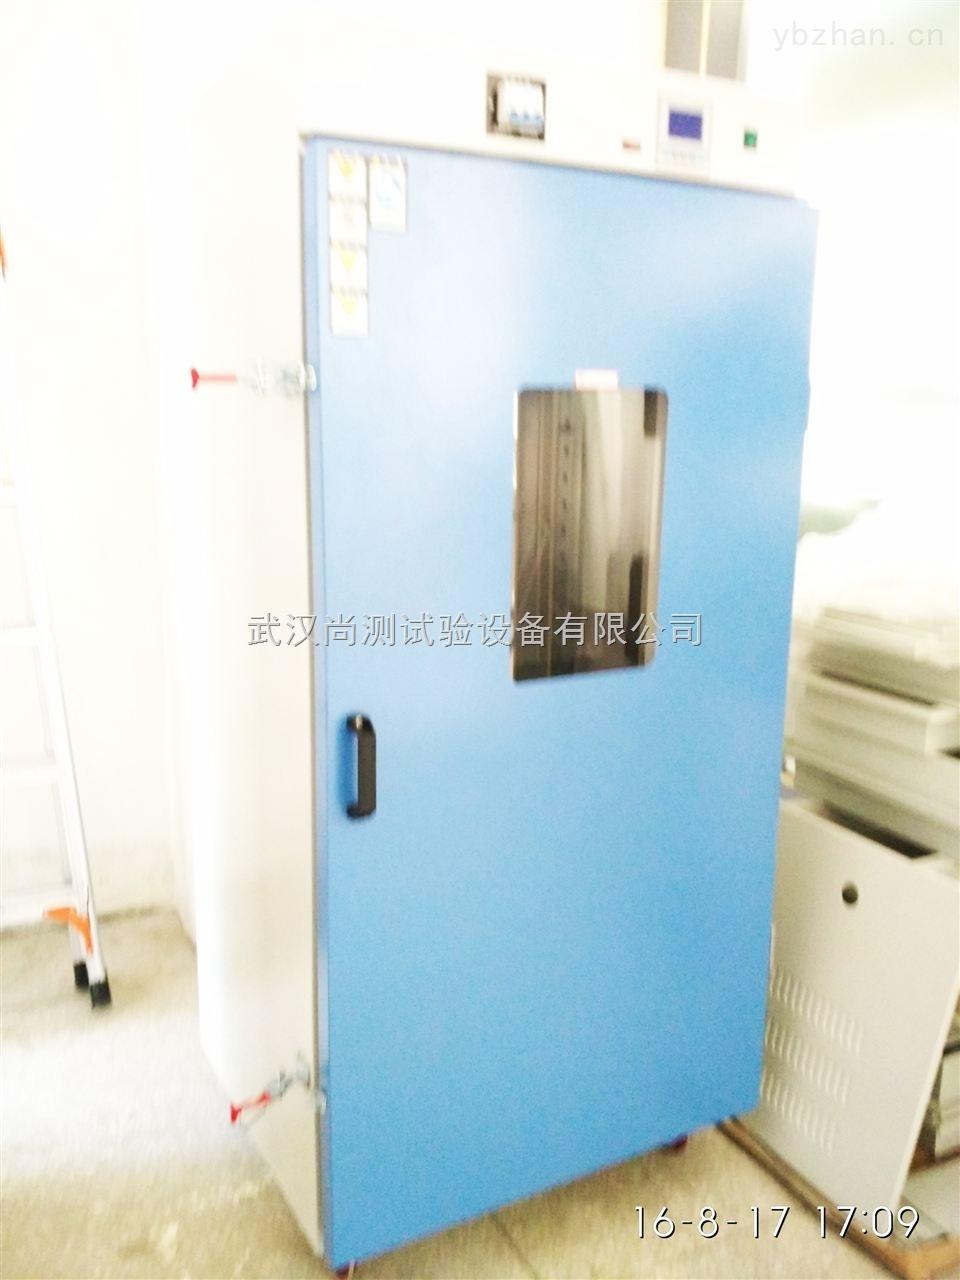 SC/QLH-100-熱空氣老化試驗箱